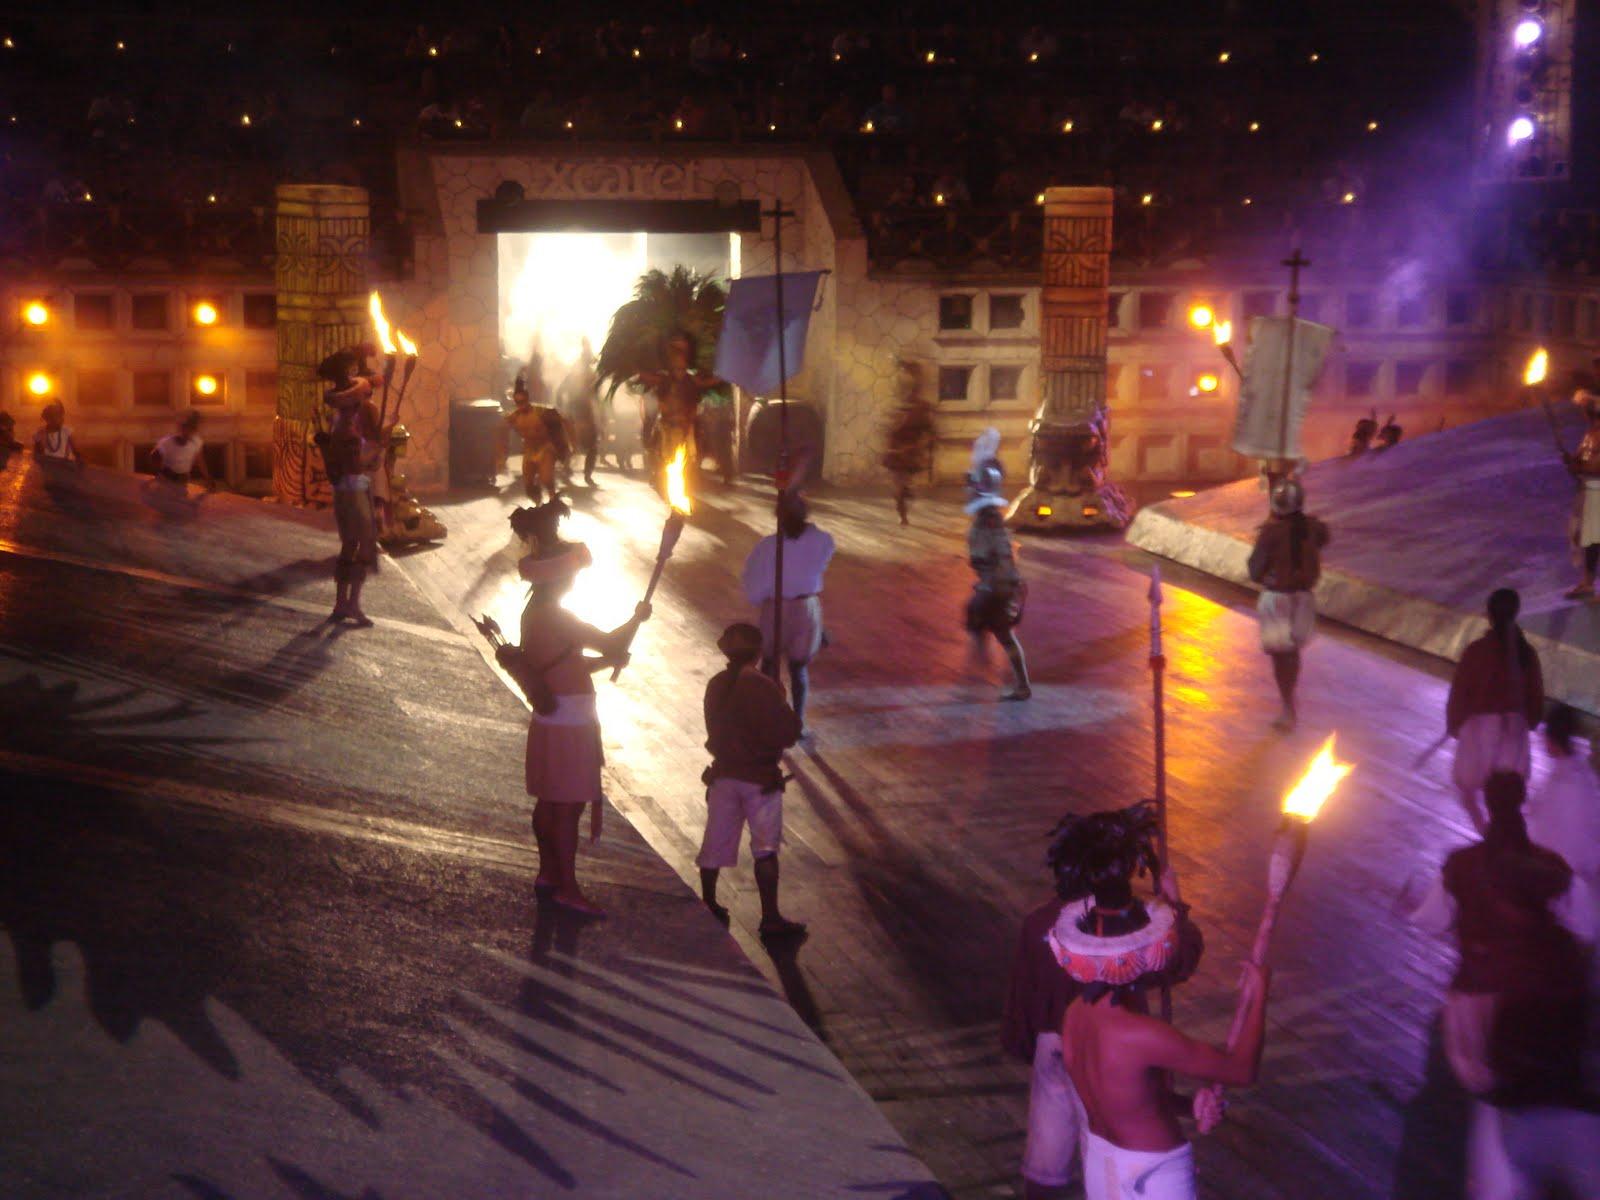 Viagens xcaret 3 parte espect culo nocturno for Espectaculo nocturno de xcaret